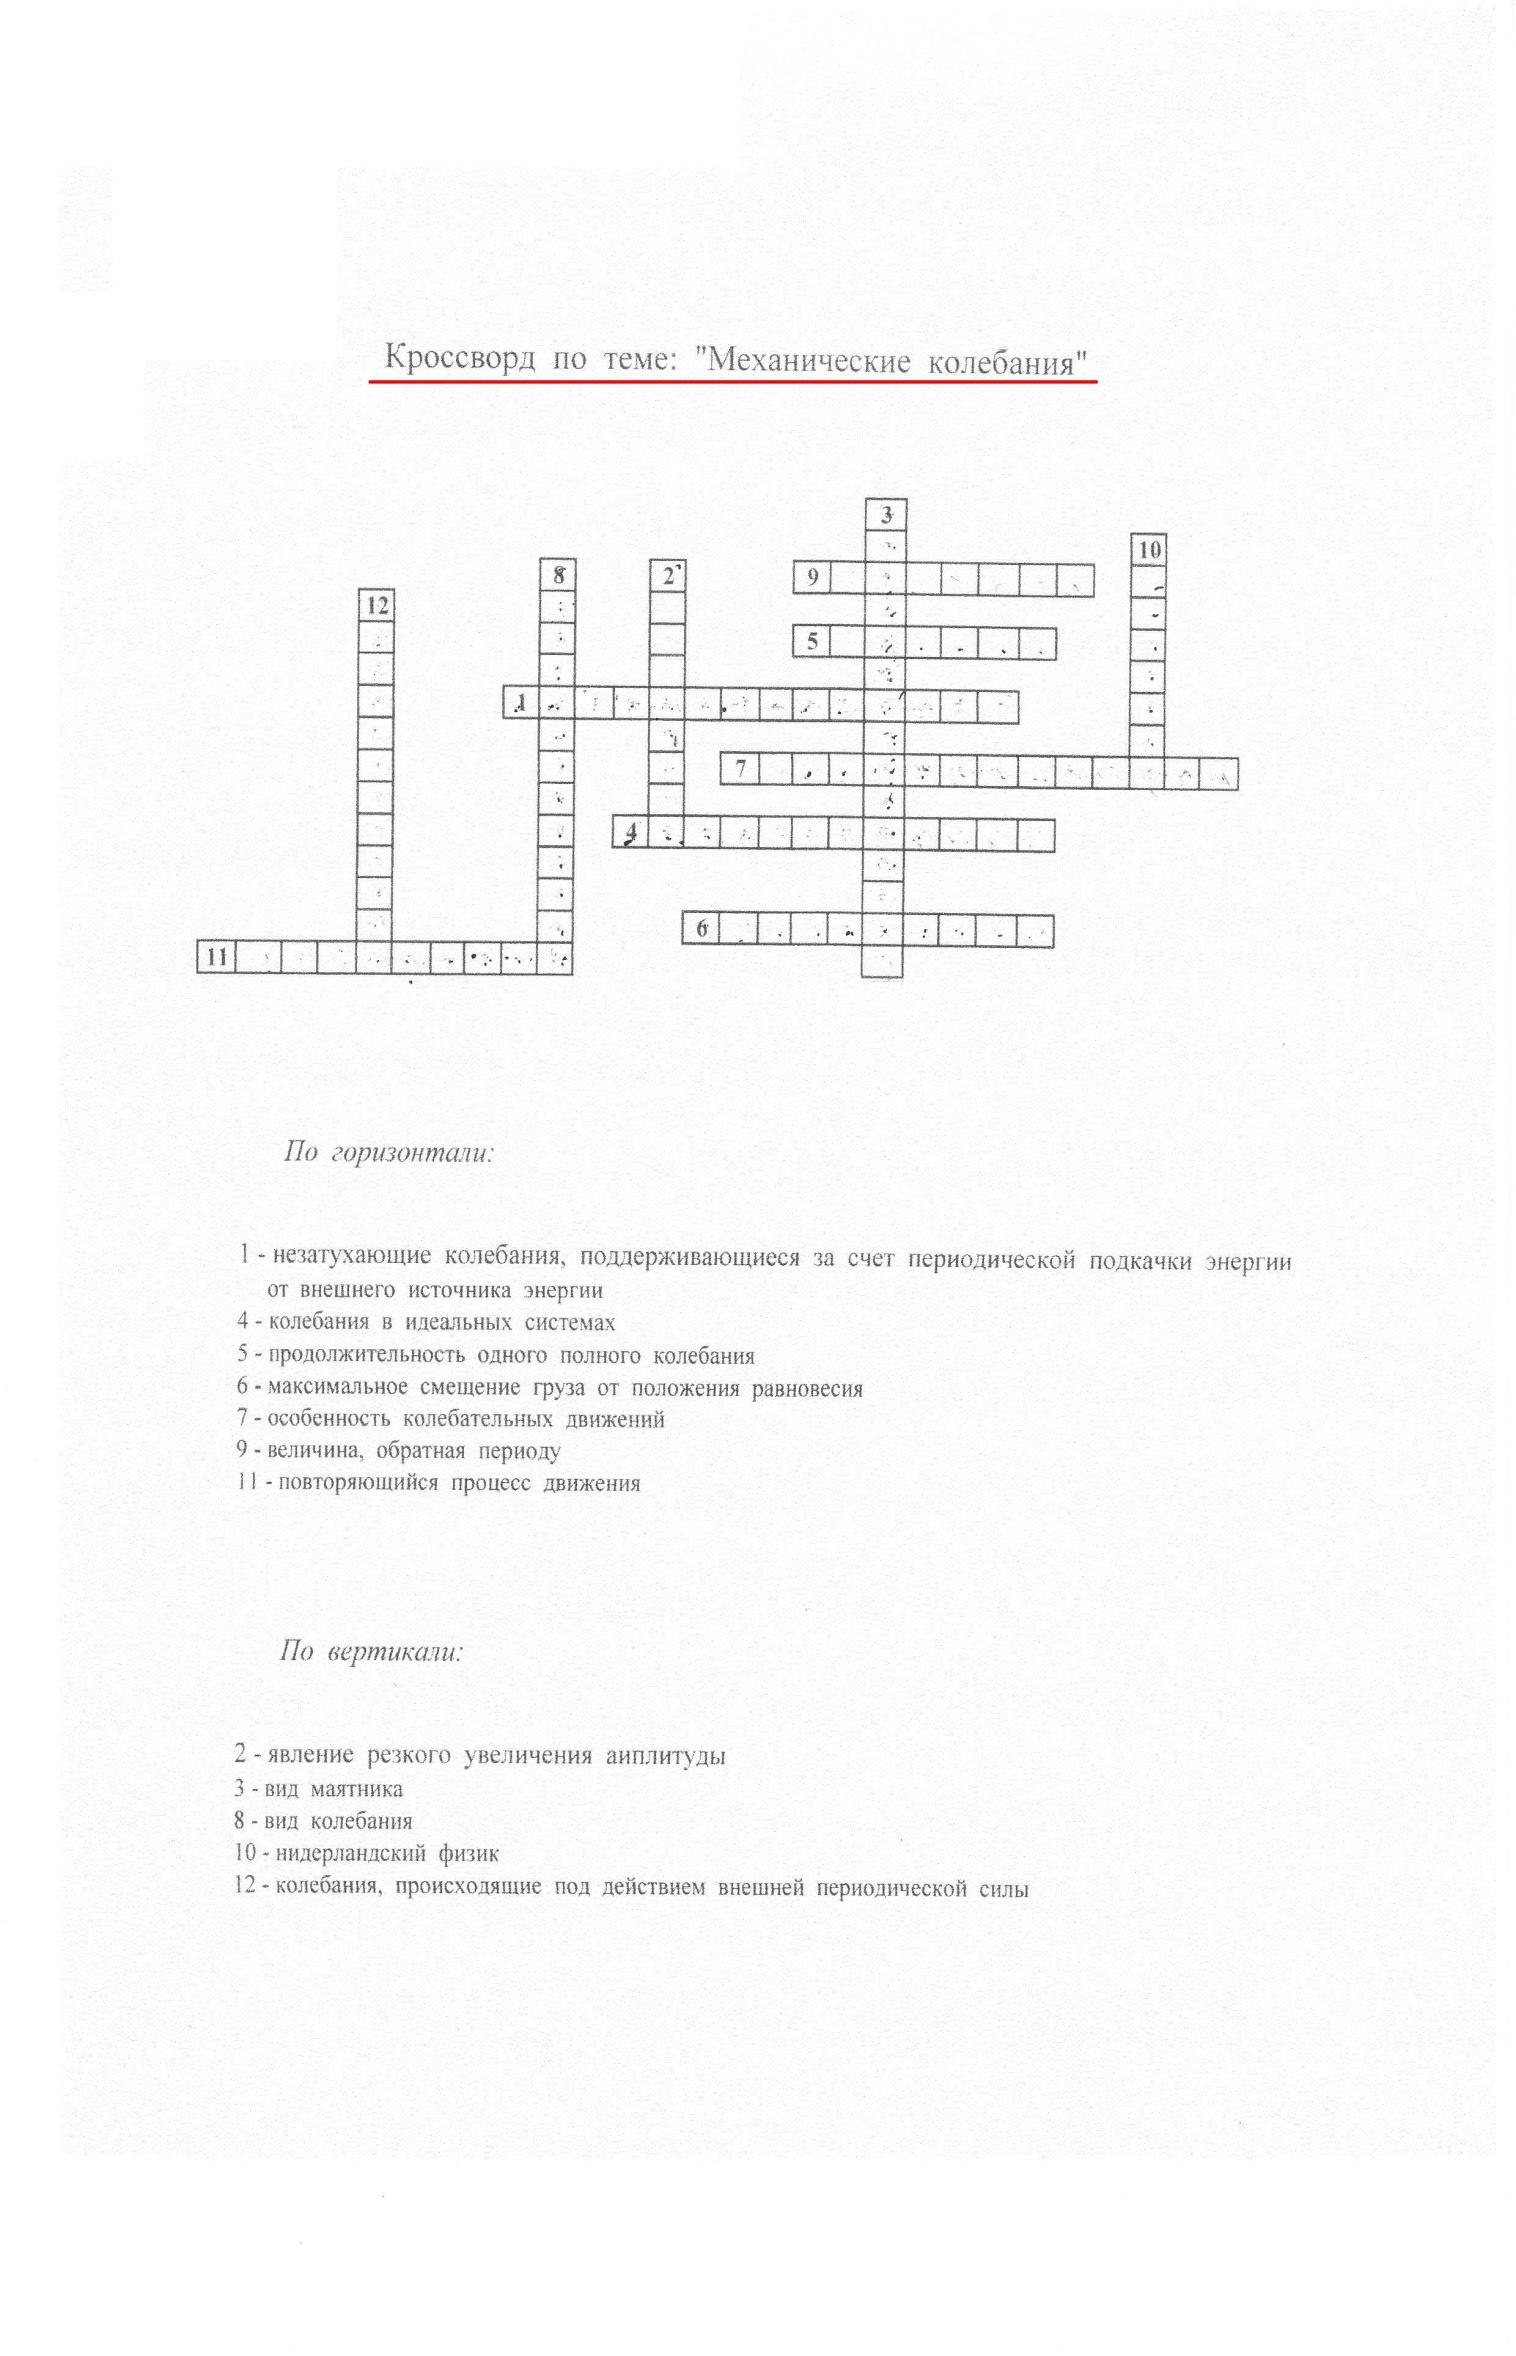 C:\Documents and Settings\UserXP\Мои документы\Мои рисунки\MP Navigator EX\кроссворды\IMG_0010.jpg